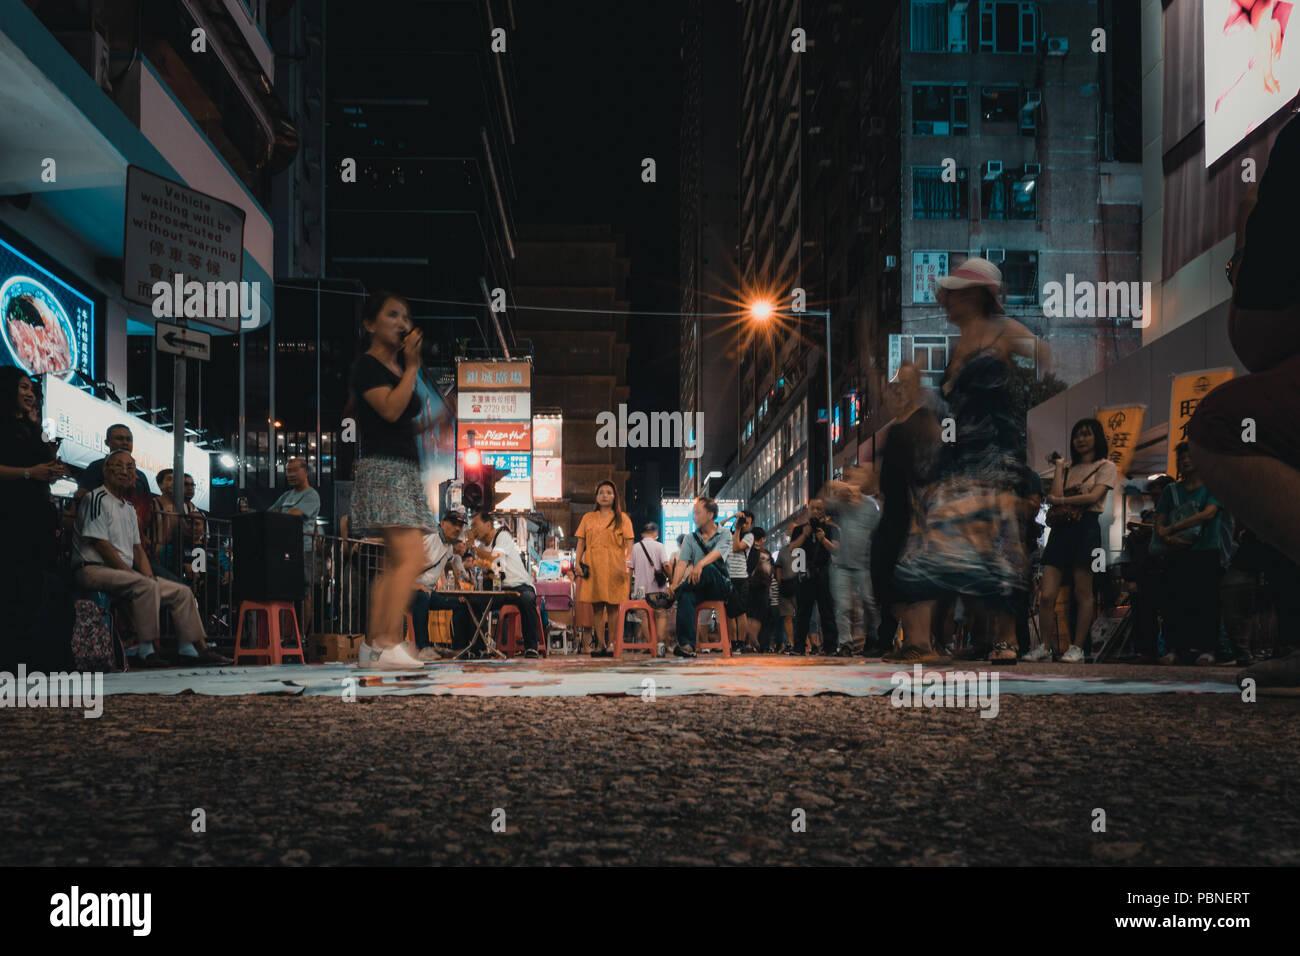 Juillet 28, 2018, Hong Kong Mong Kok: la culture de la rue. Regarder les gens d'un musicien de rue performance à Sai Yeung Choi Street, Mongkok à Hong Kong. Photo Stock